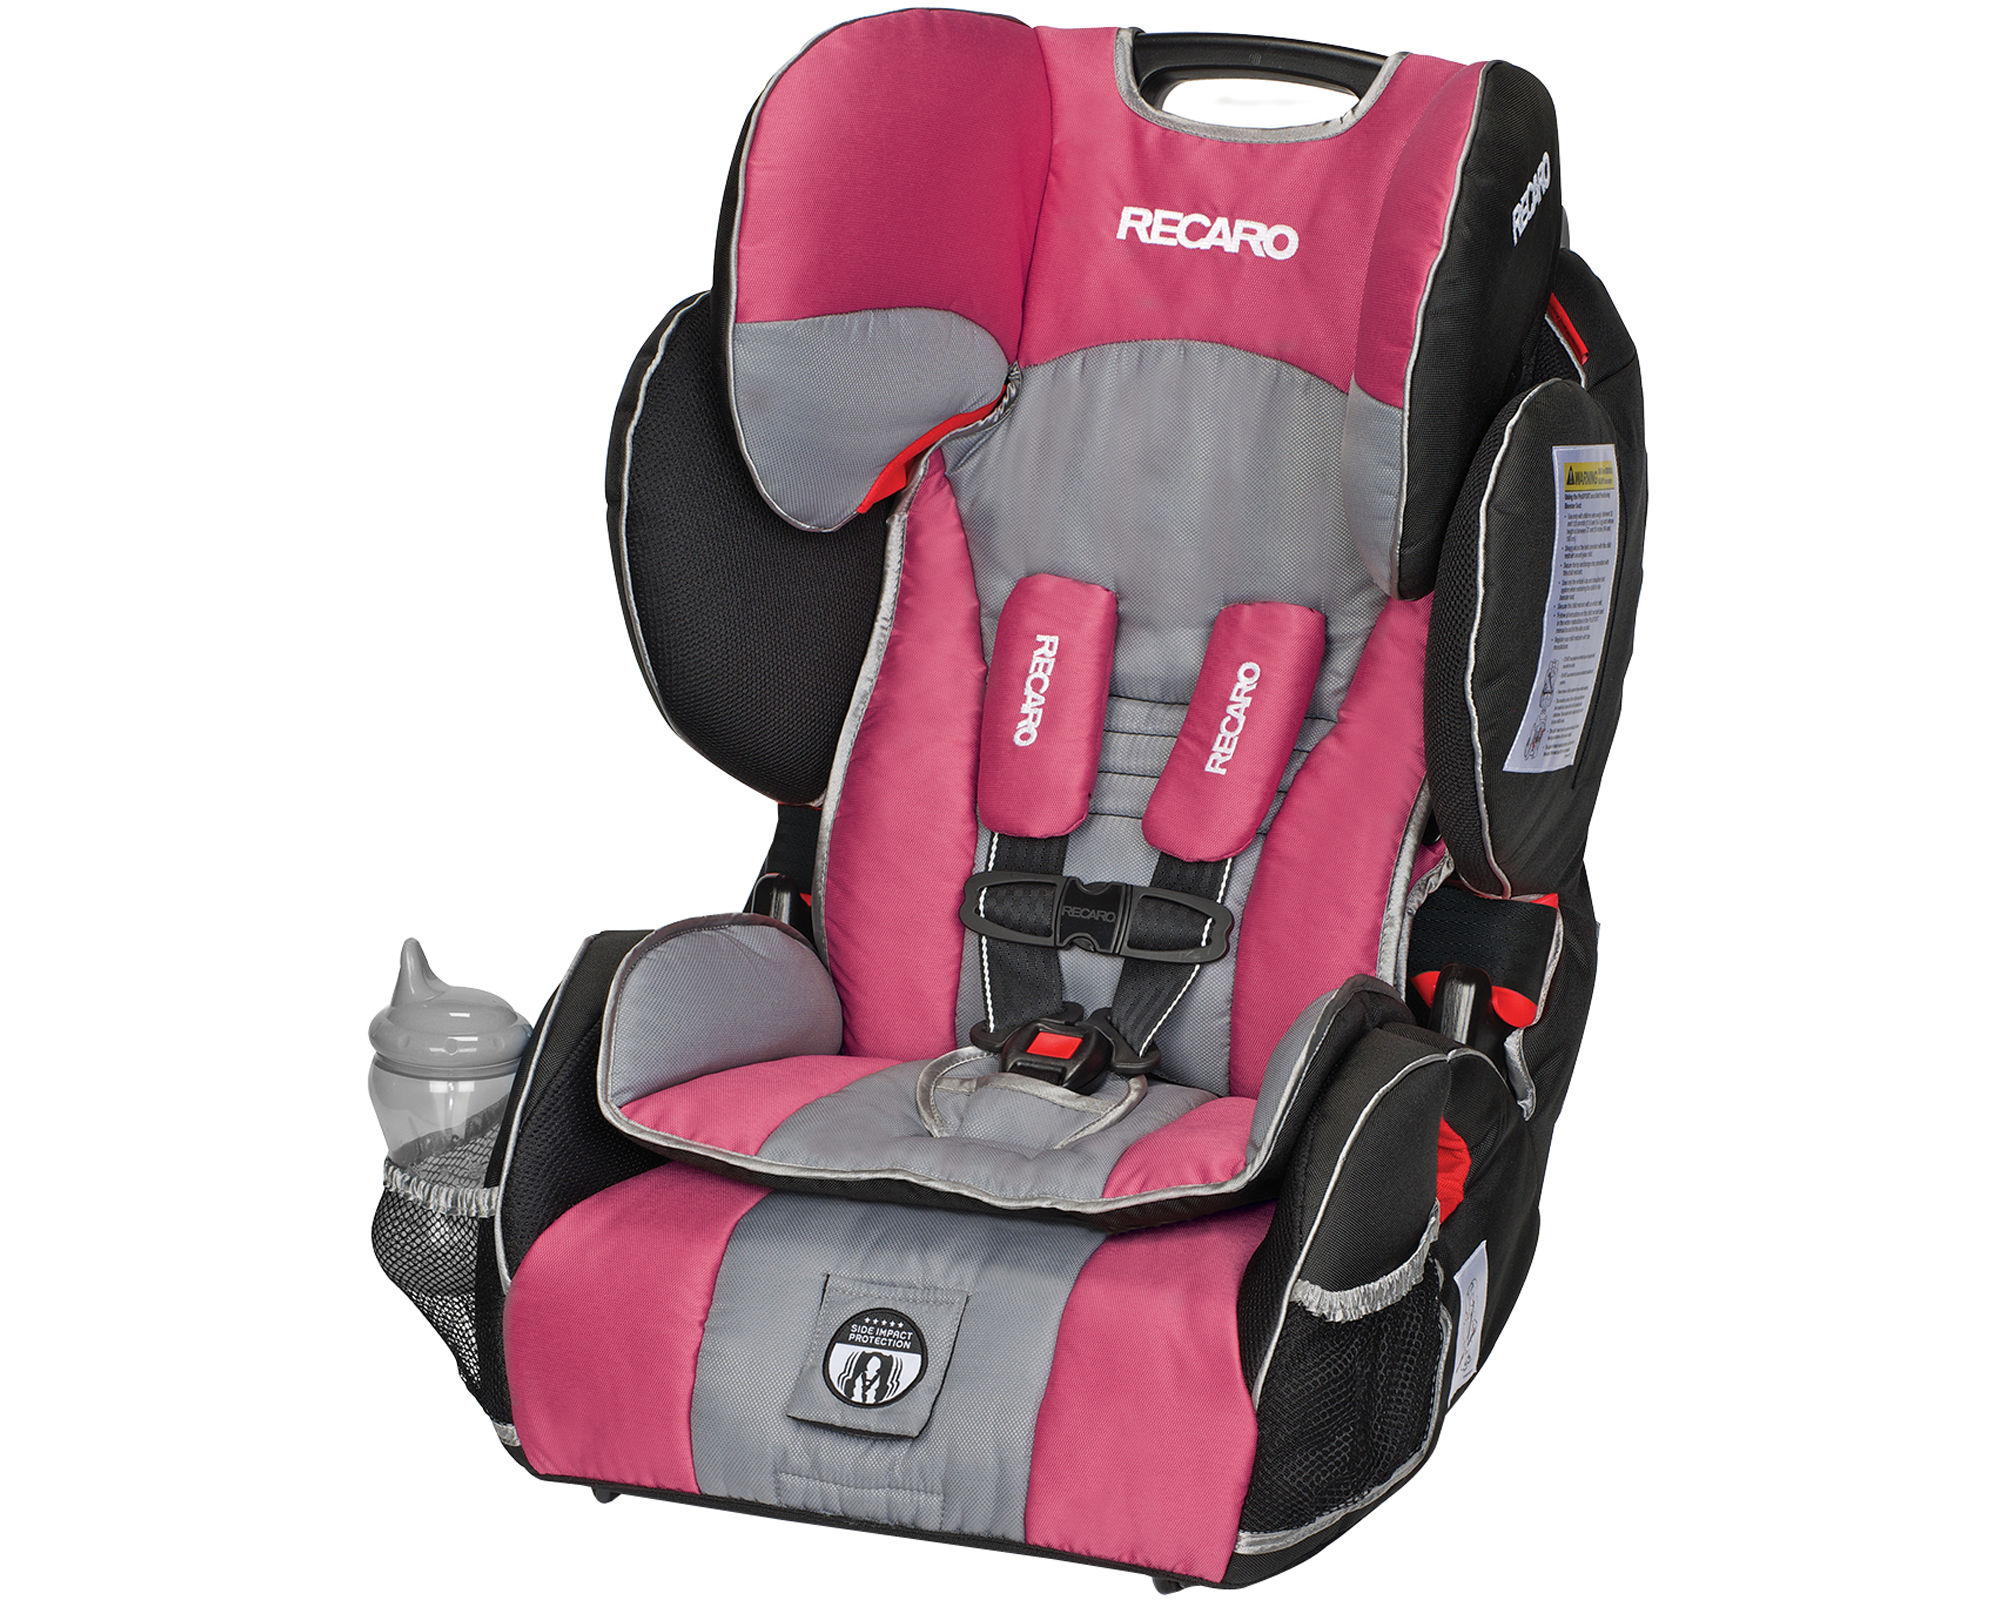 Recaro Performance Sport Harness Booster Car Seat - Rose